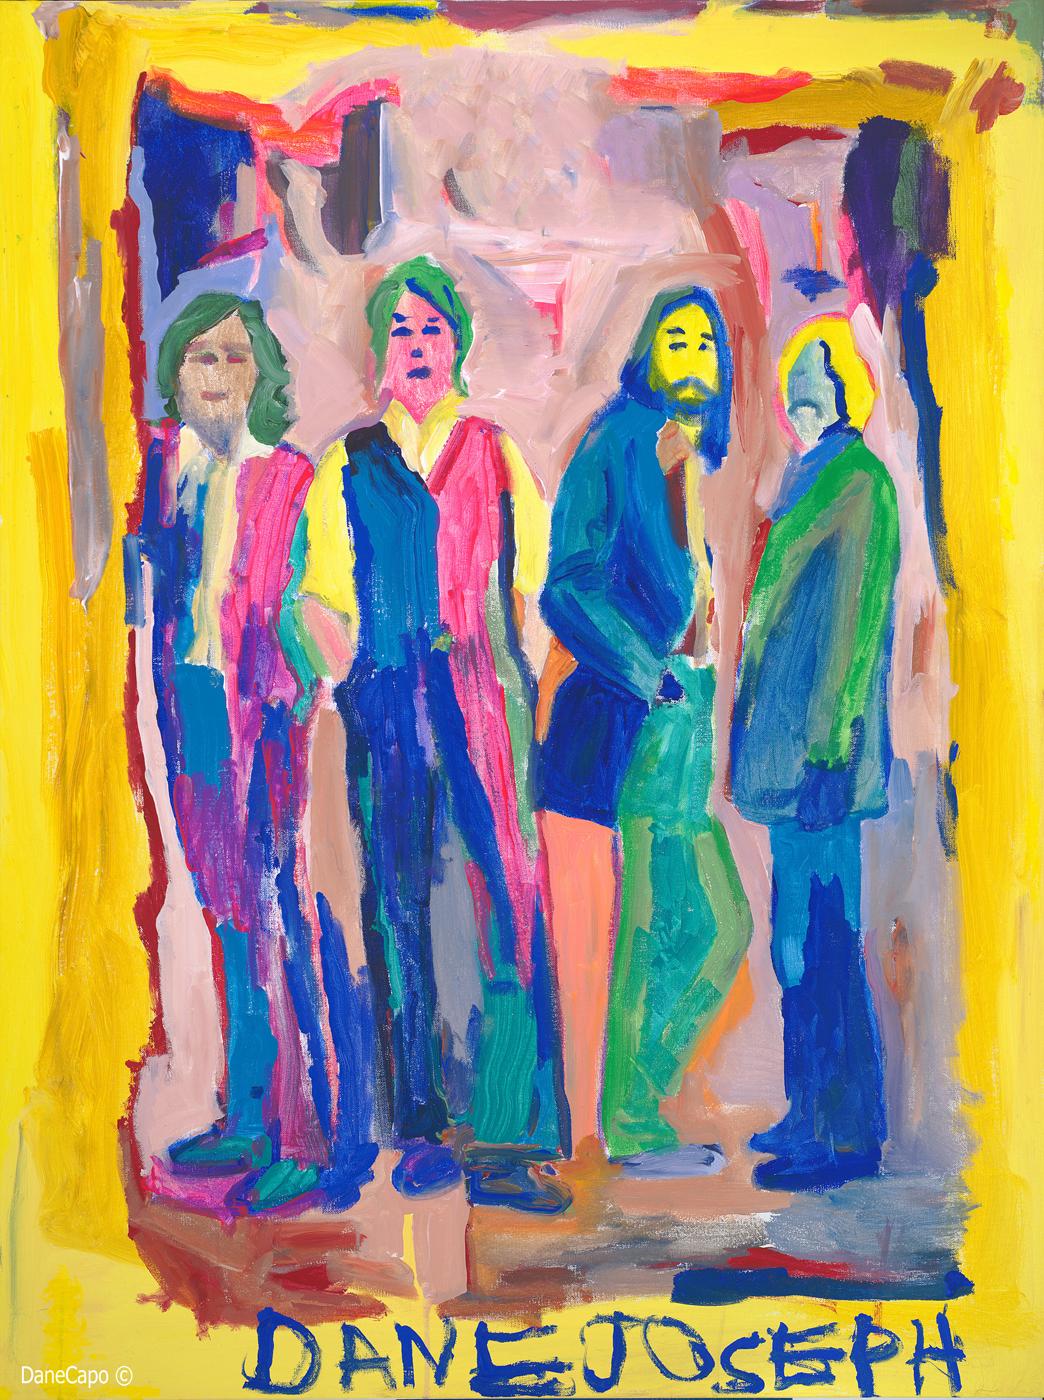 The Beatles by Dane Capo